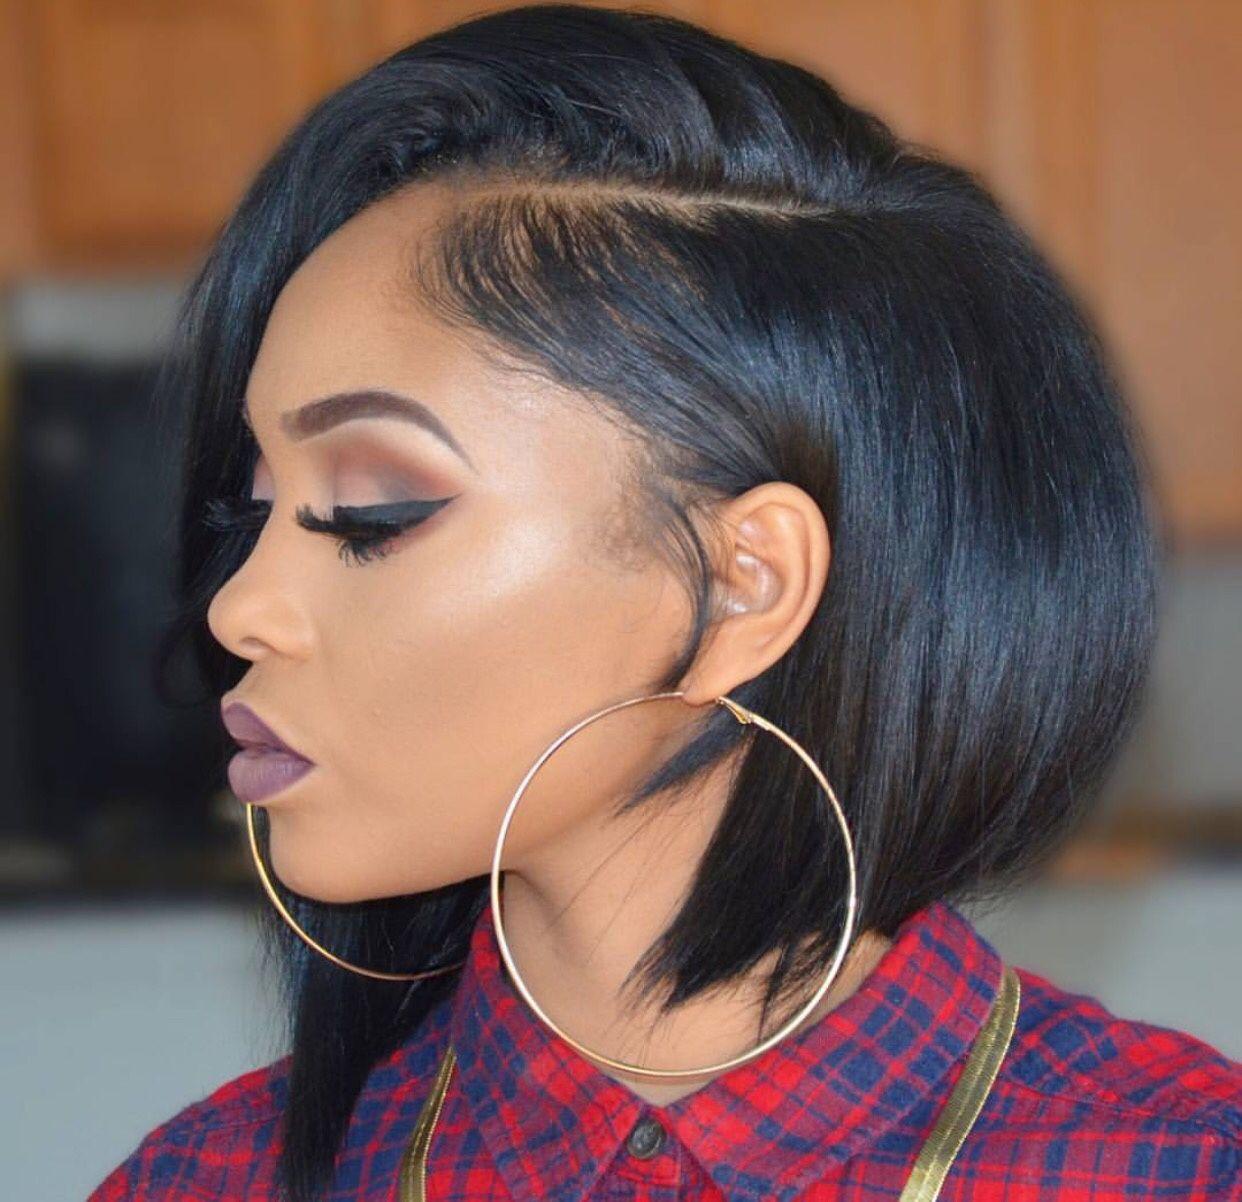 Cu cute bob hairstyles for women over 50 - Girls